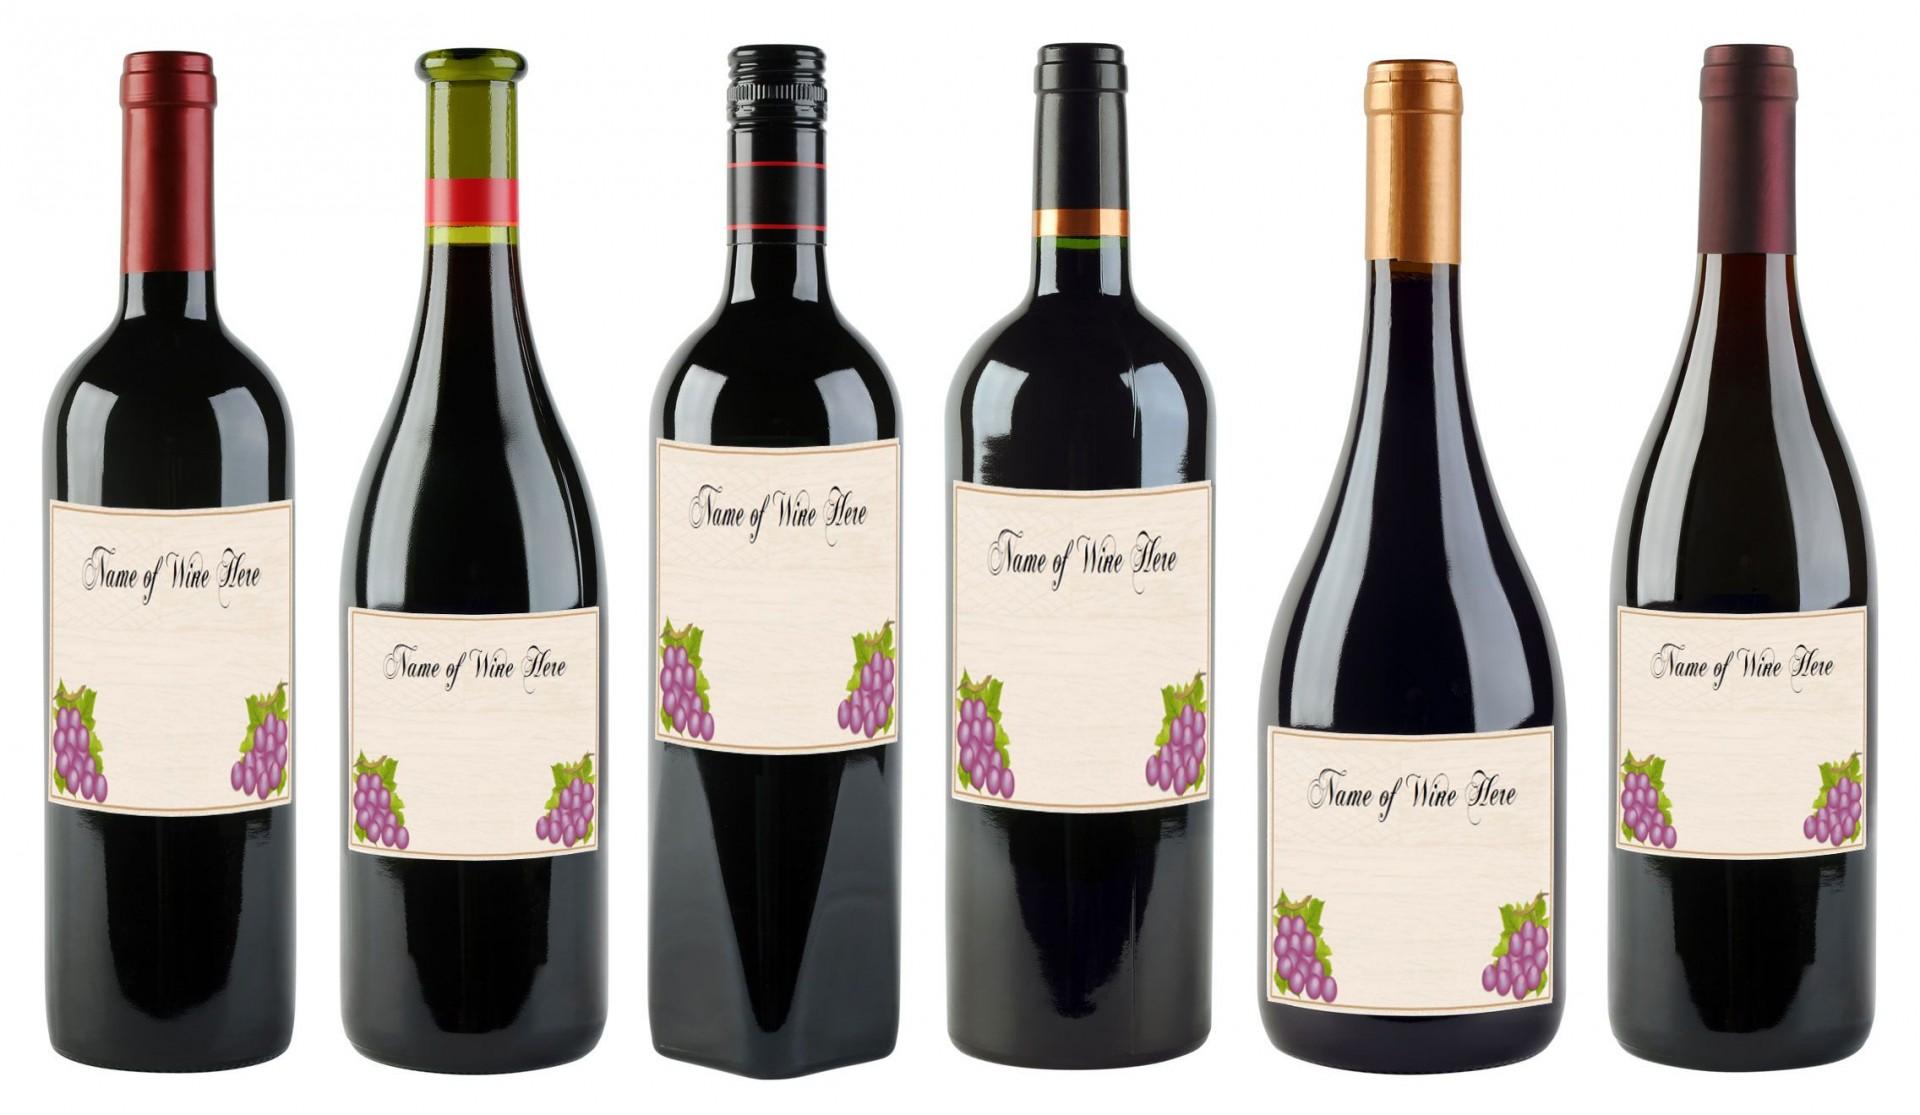 000 Astounding Free Wine Label Template High Def  Online Custom Downloadable Bottle1920